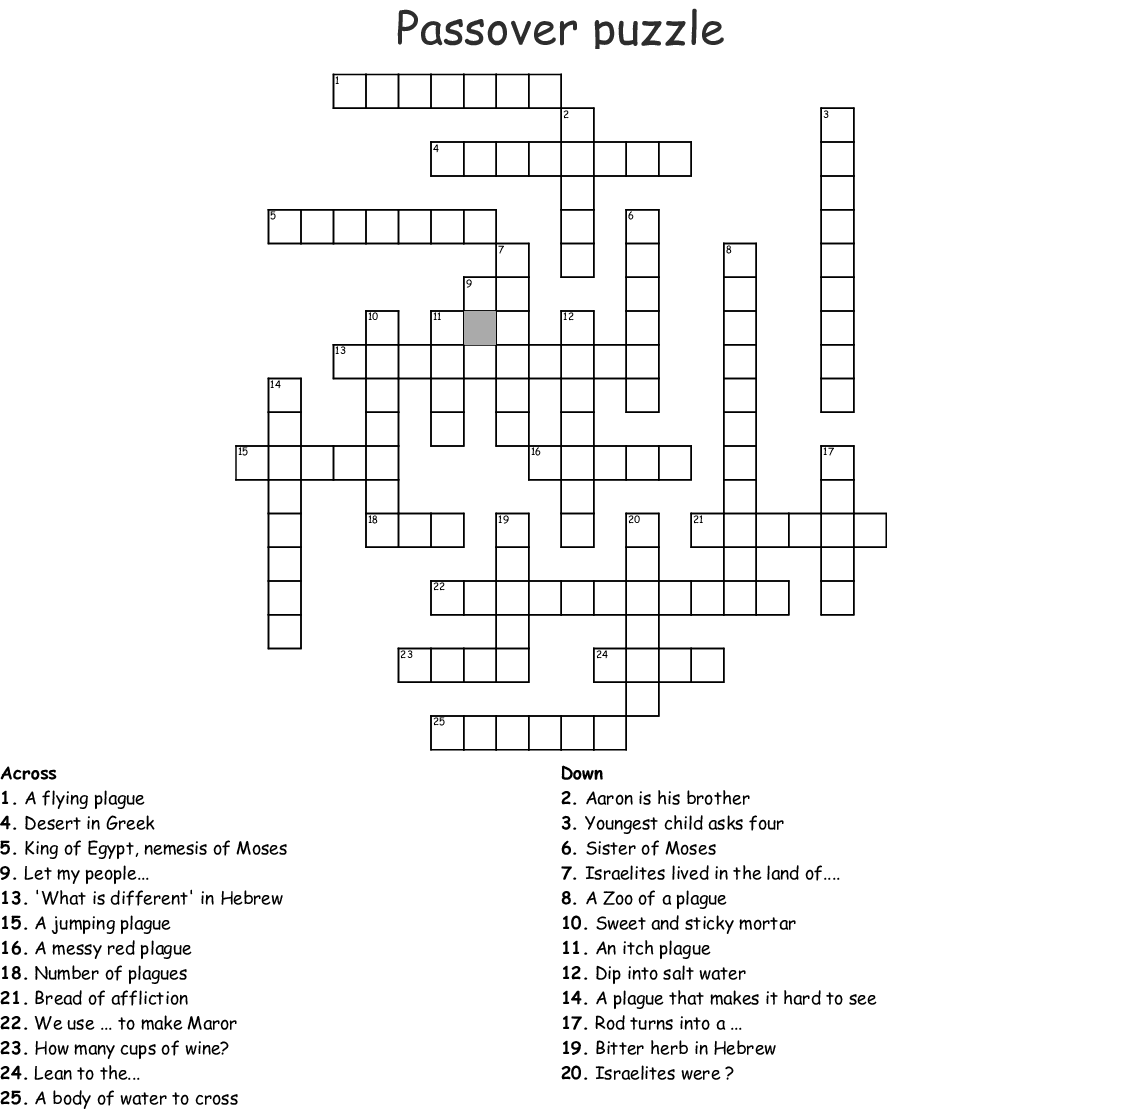 Passover Puzzle Crossword